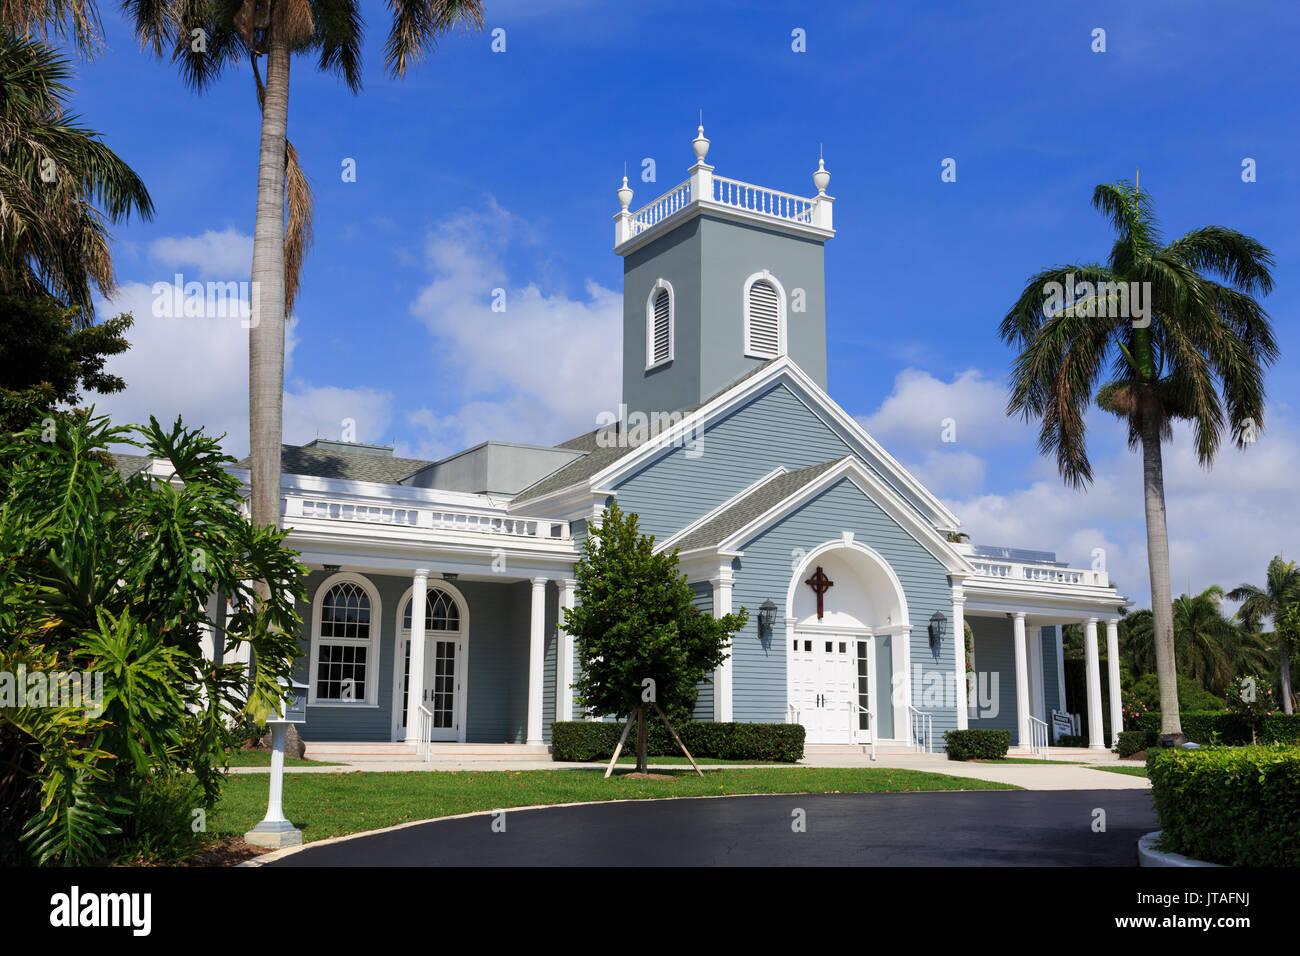 Royal Poinciana Chapel, Palm Beach, Florida, United States of America, North America - Stock Image